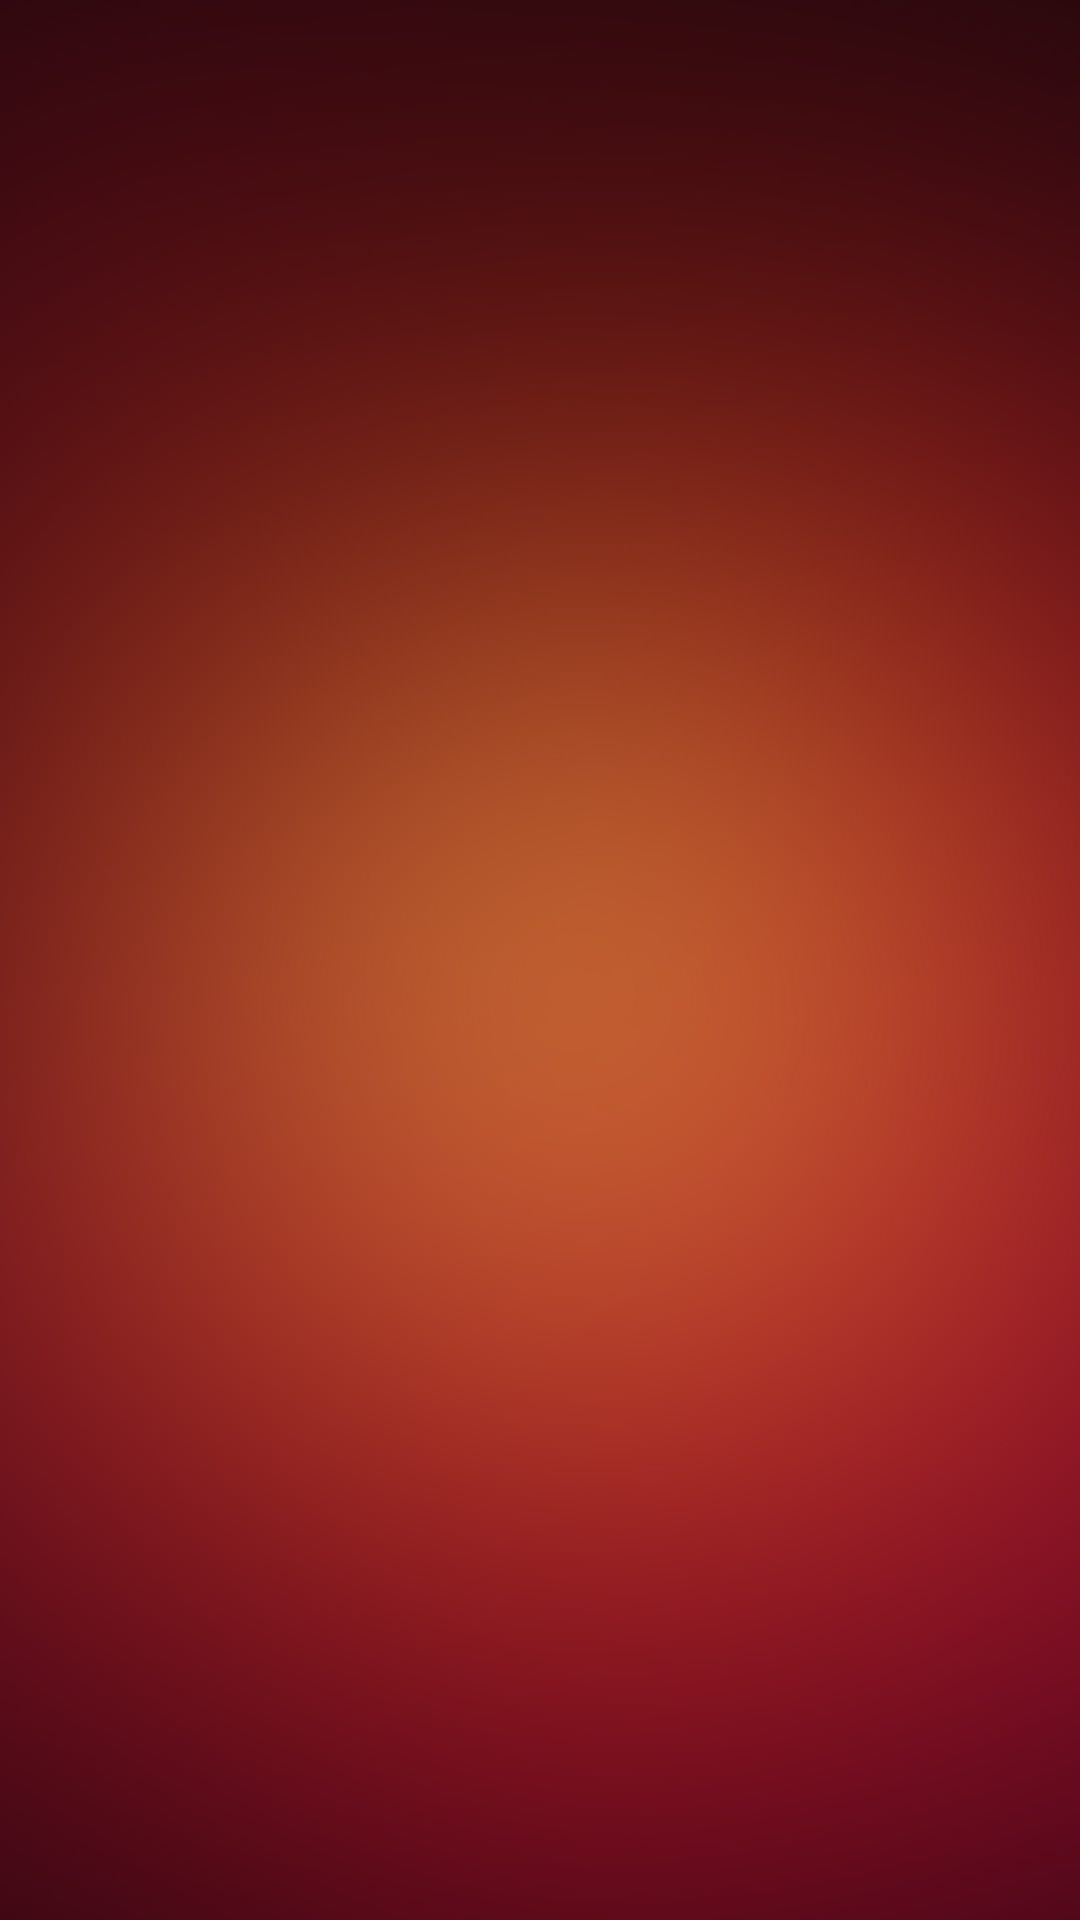 pattern black red wallpapersc smartphone